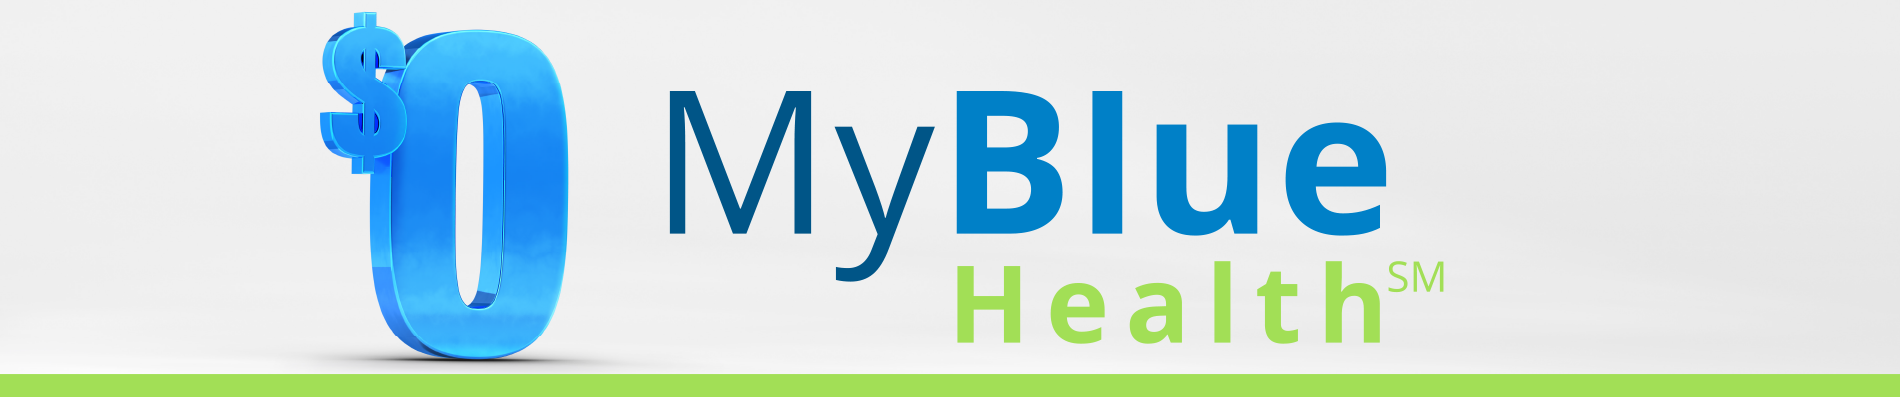 MyBlue Health HMO Plan | Blue Cross and Blue Shield of Texas